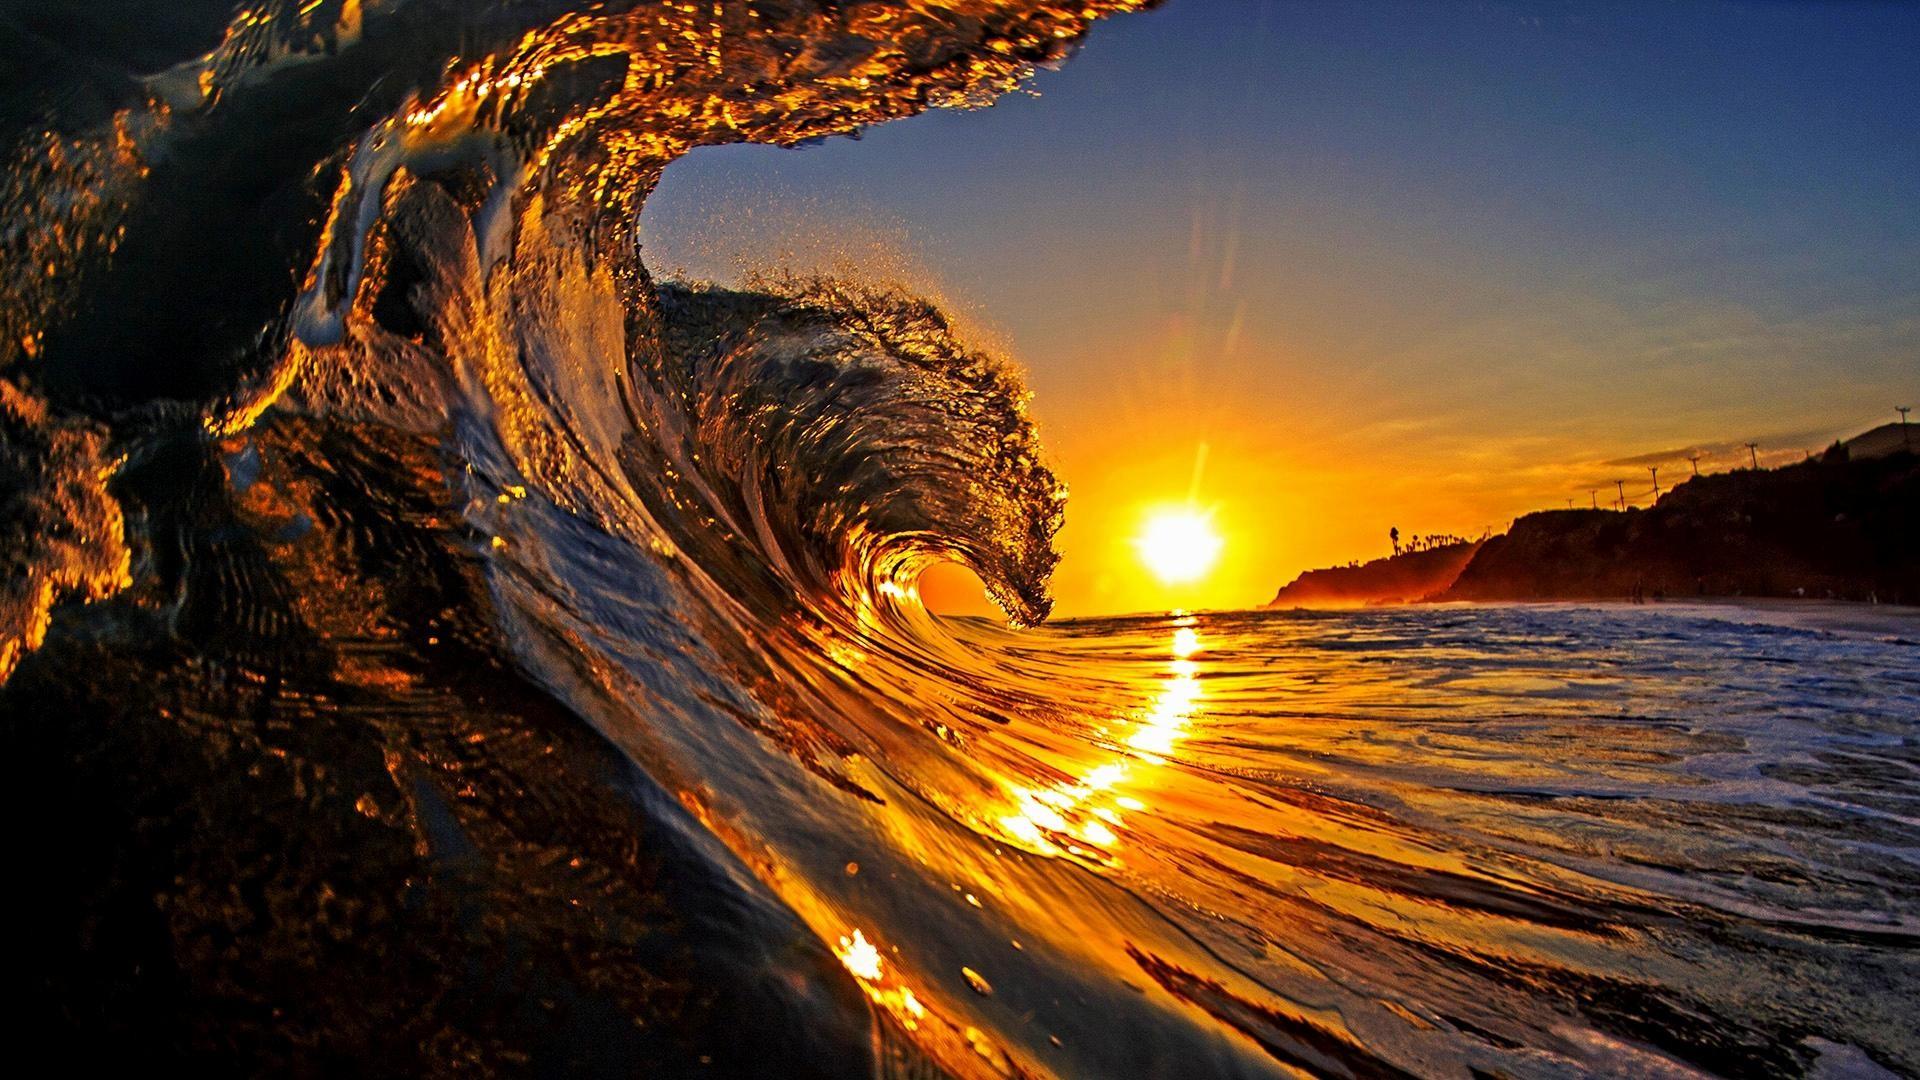 Sea-Waves-Wallpaper-Widescreen-HD